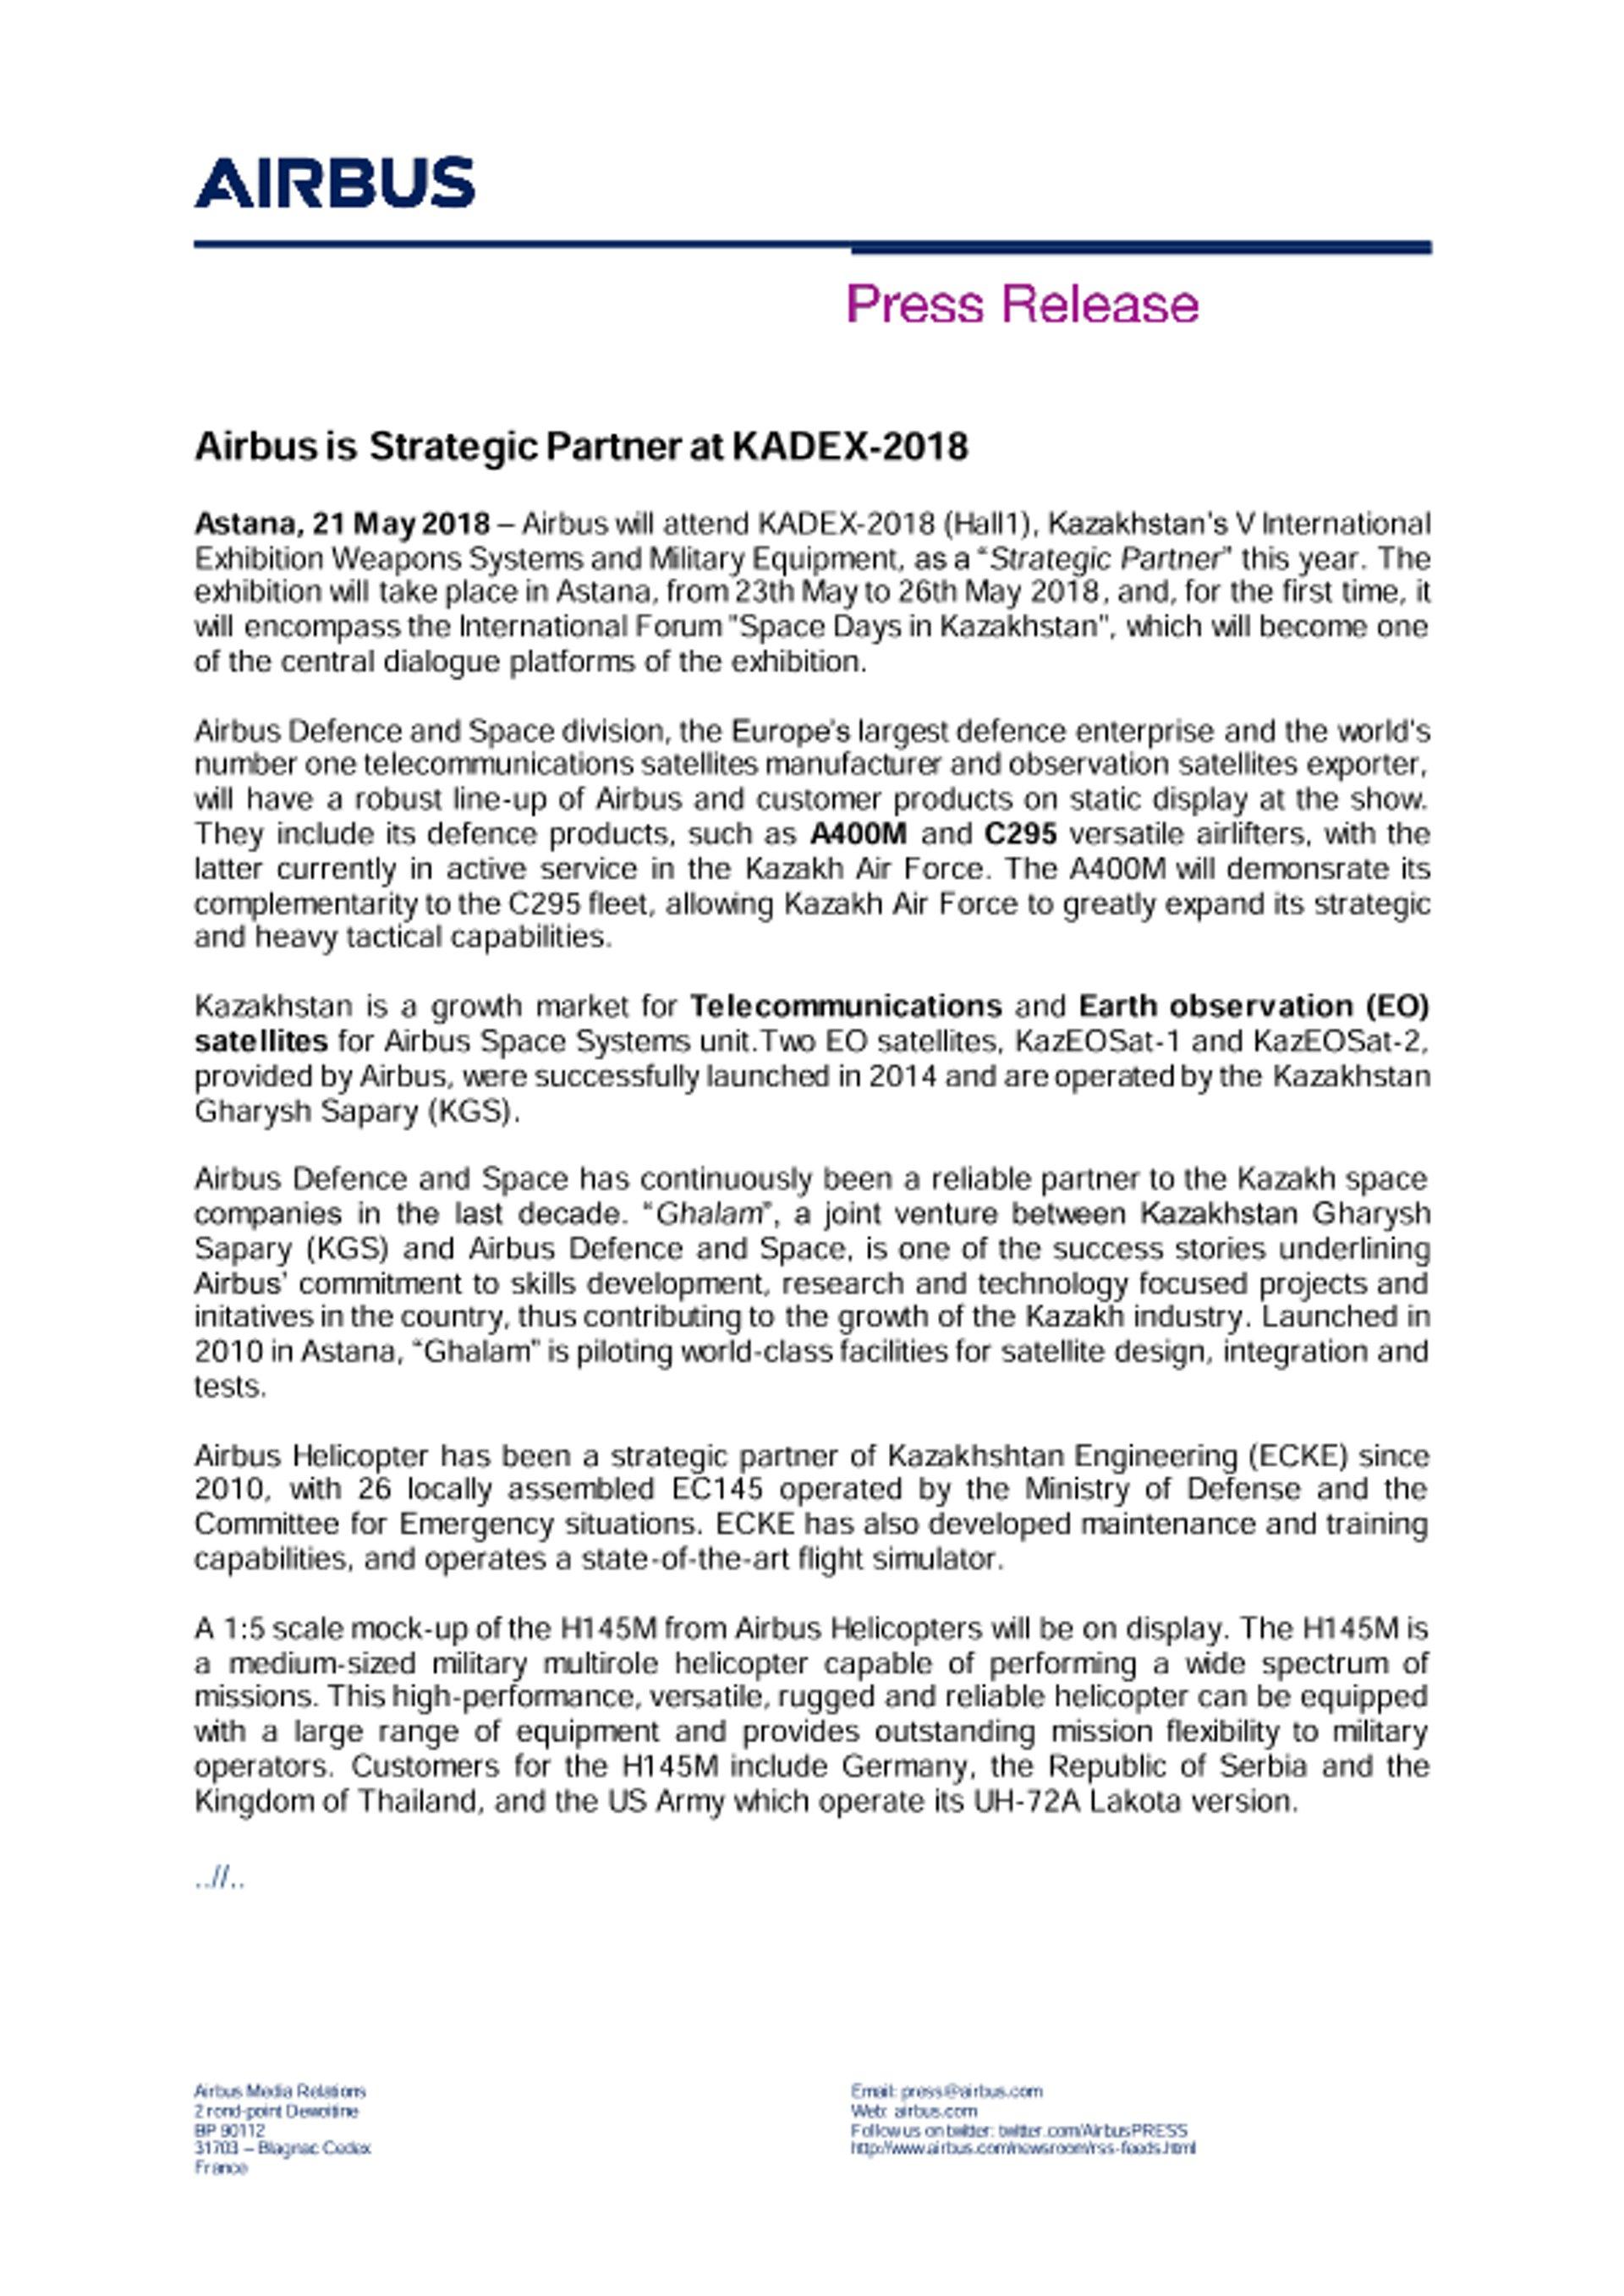 Press Release AIRBUS KADEX 21052018 ENG